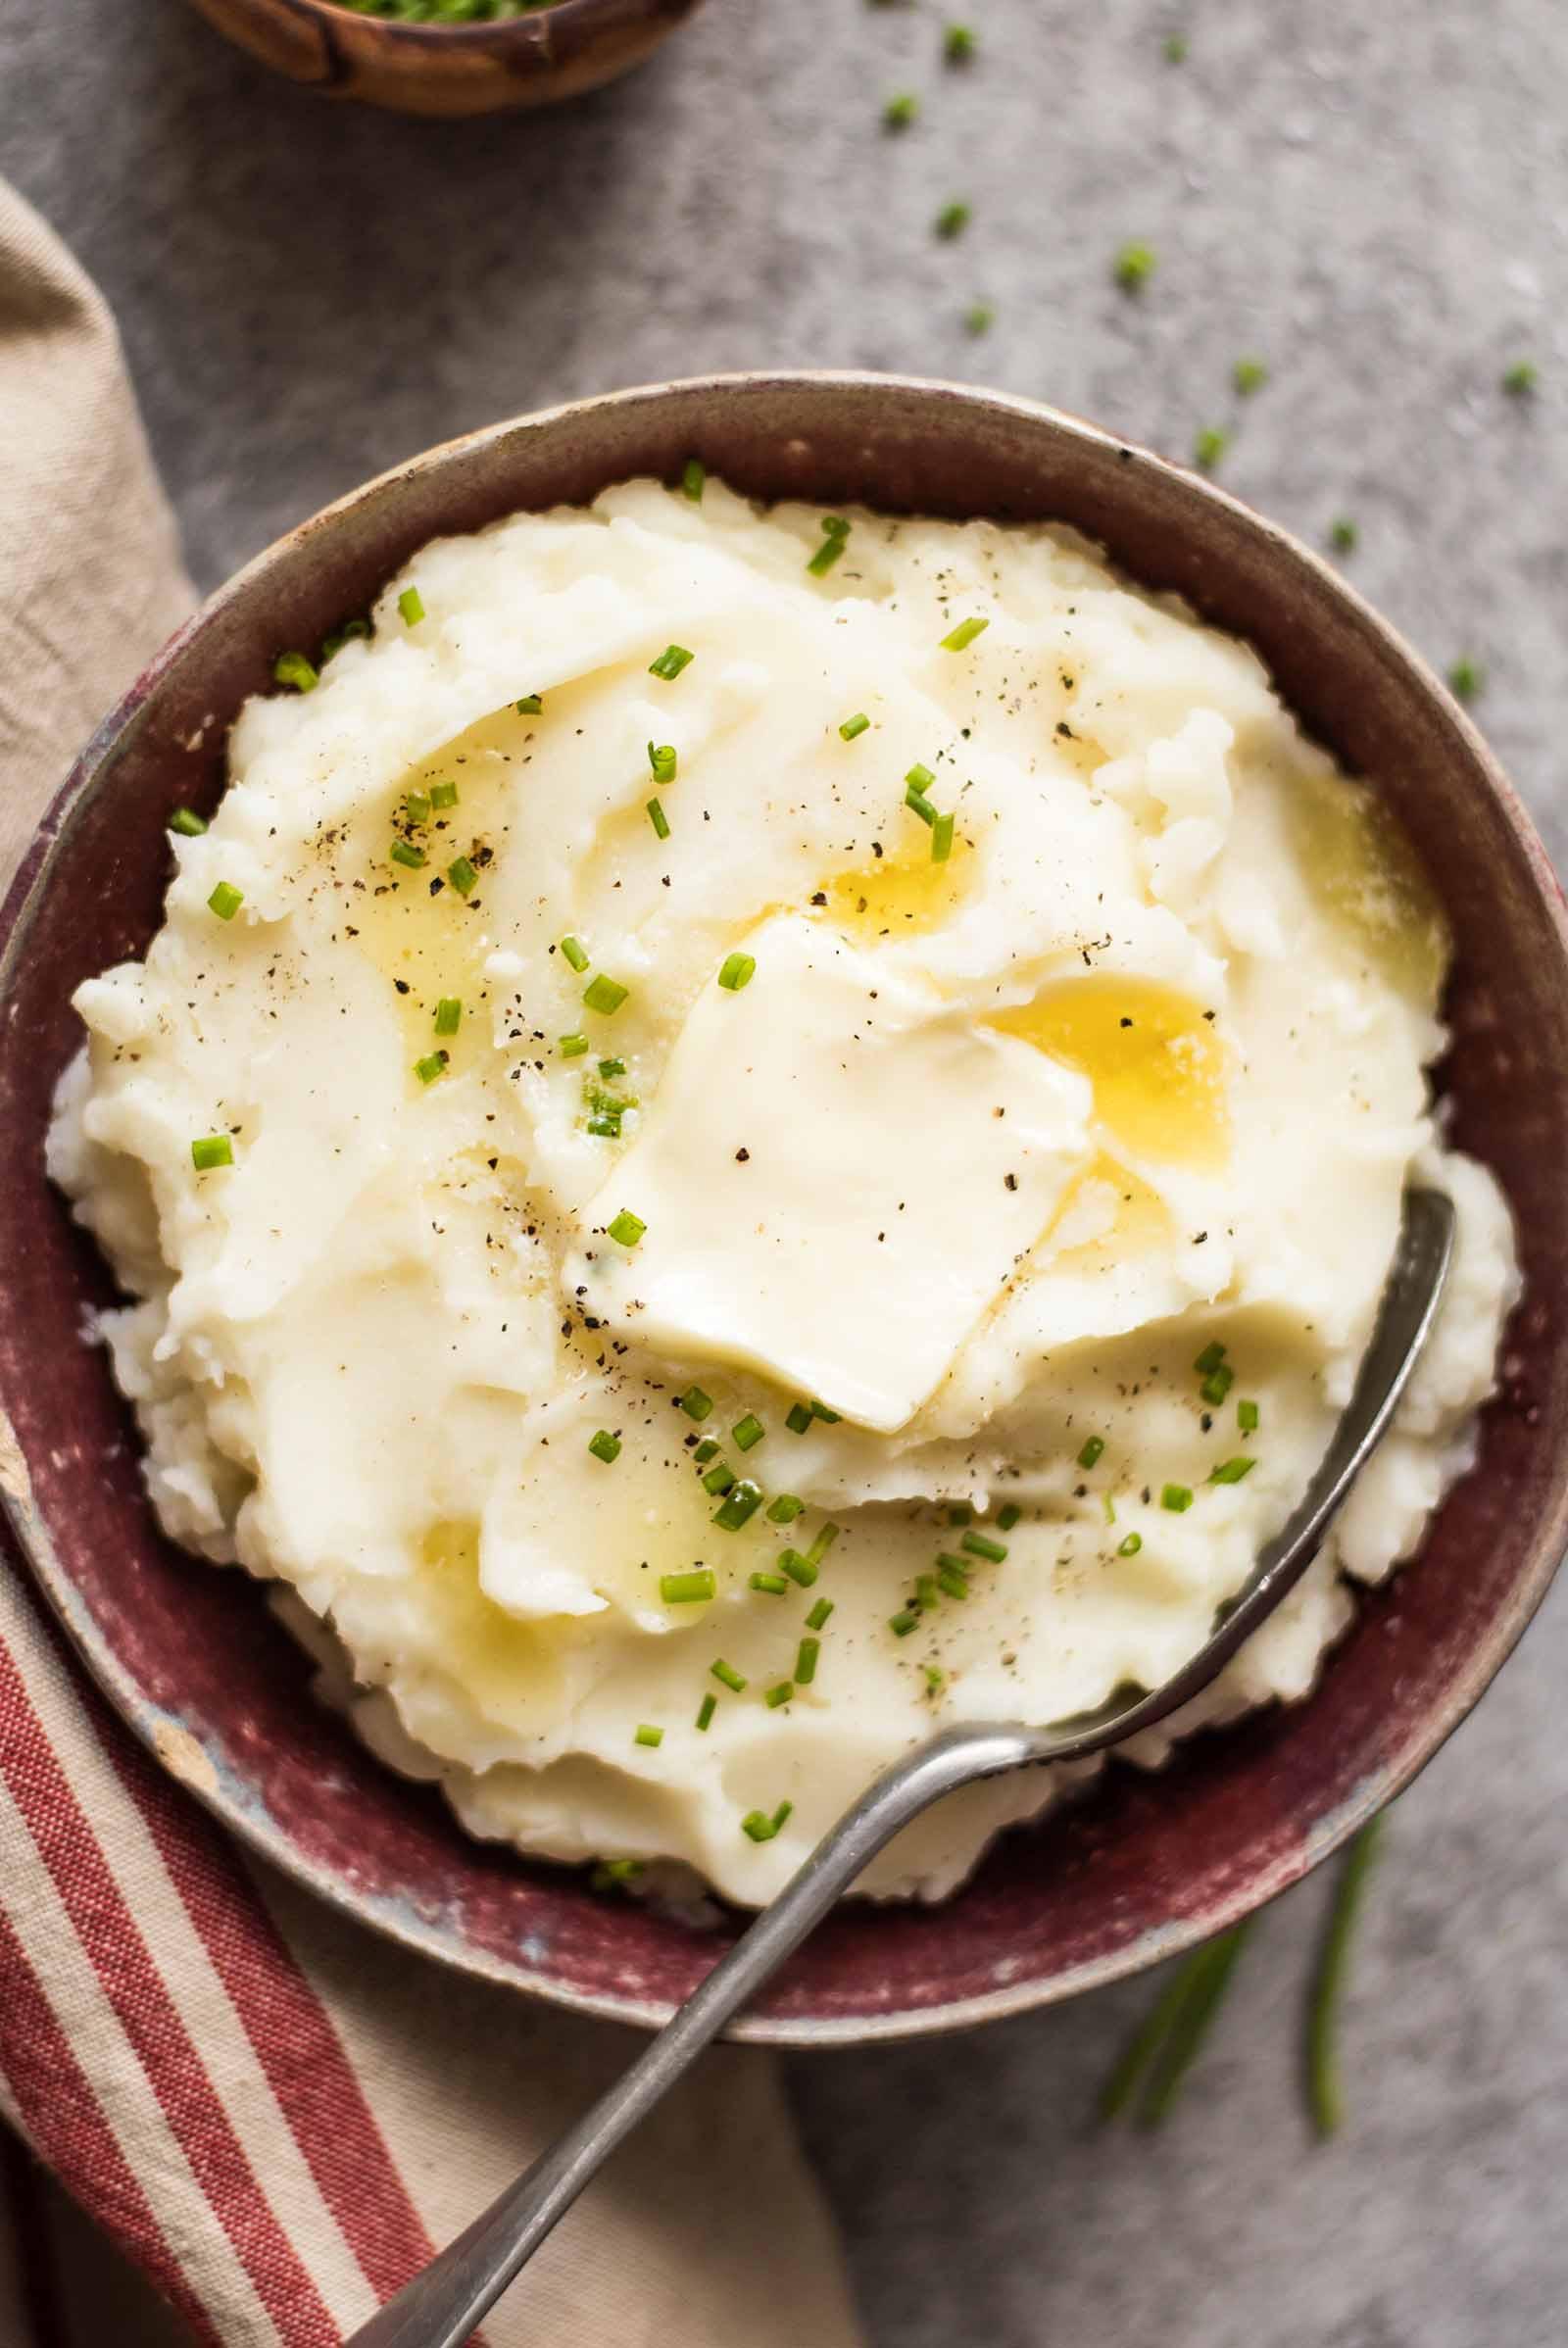 Mashed Potatoes For Thanksgiving  Crock Pot Mashed Potatoes Easy & No Stress